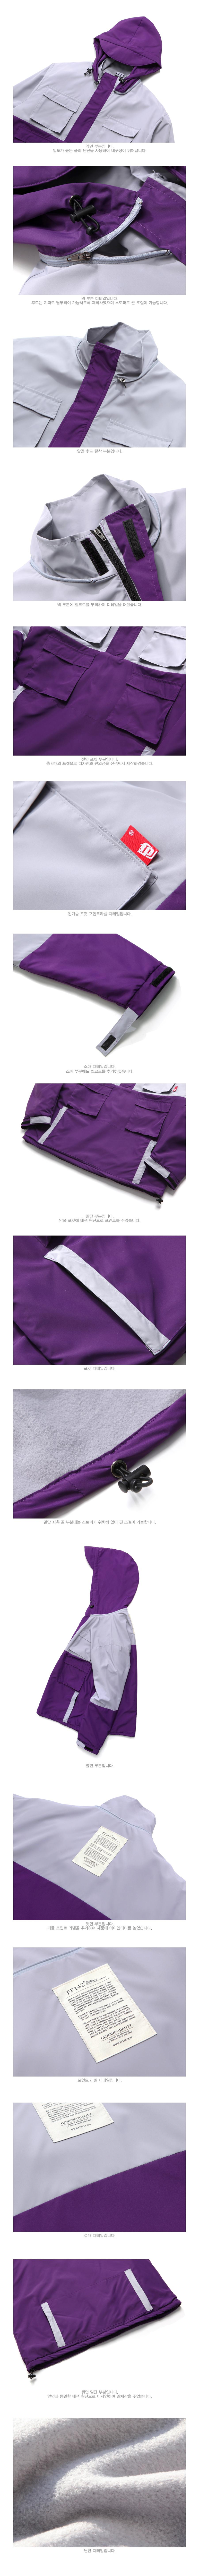 20181023_fp_activeanorak_purple_uk_02.jpg